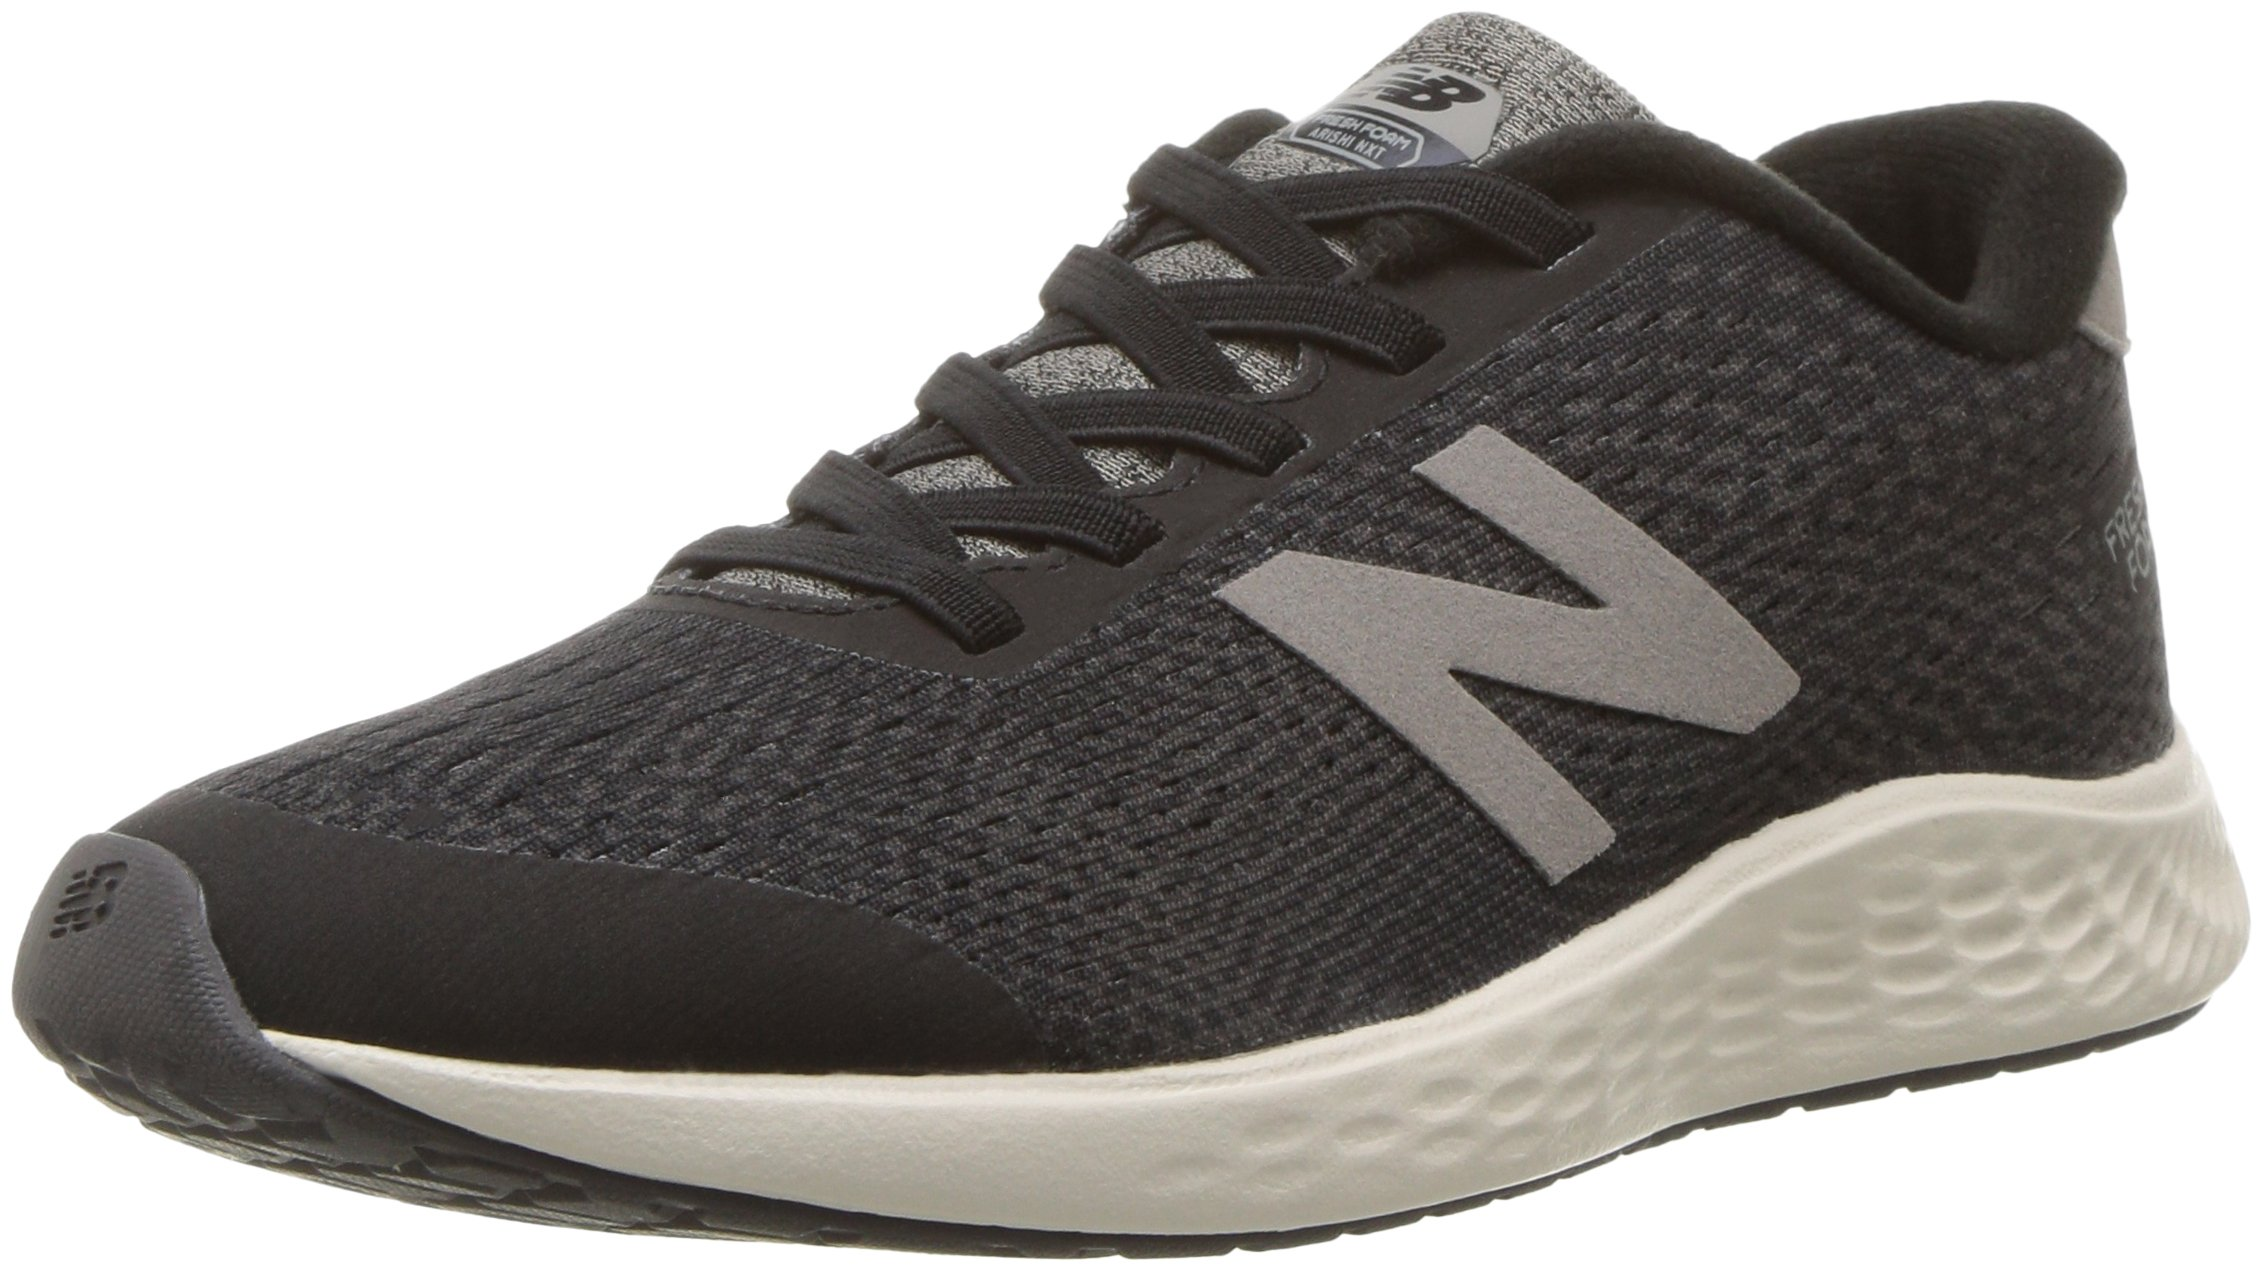 New Balance Boys' Arishi Next V1 Hook and Loop Running Shoe Black/Magnet 3 W US Little Kid